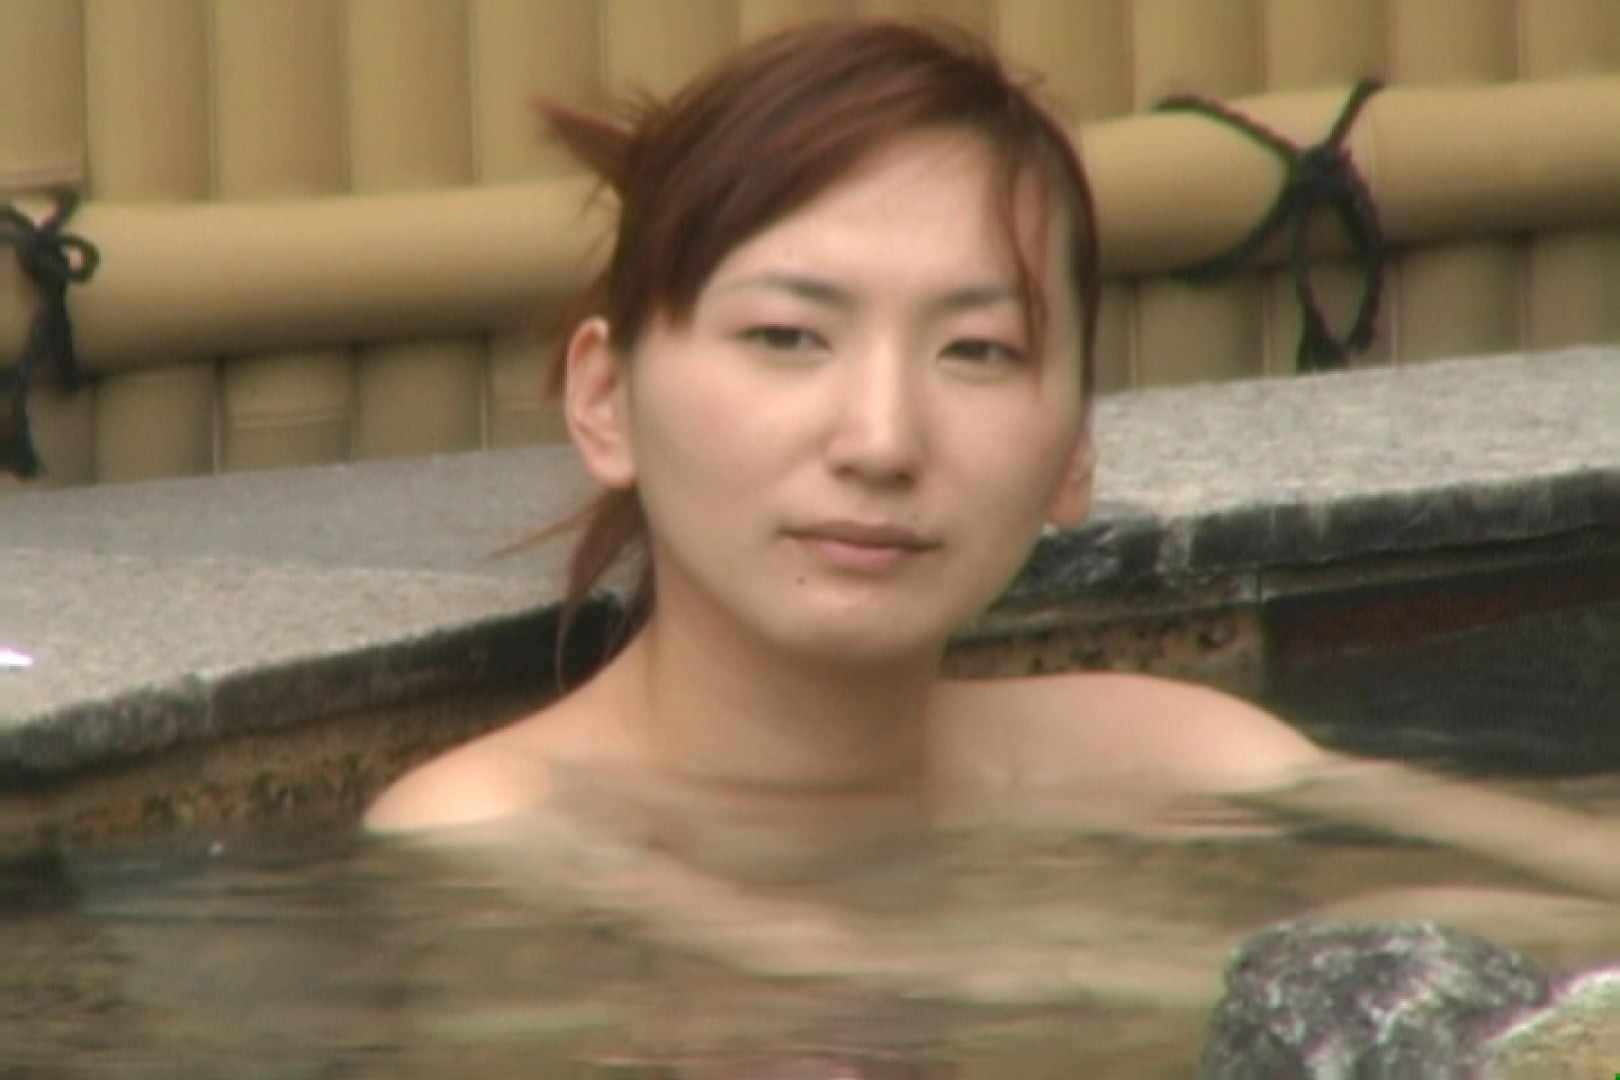 Aquaな露天風呂Vol.616 露天   OLセックス  99画像 85